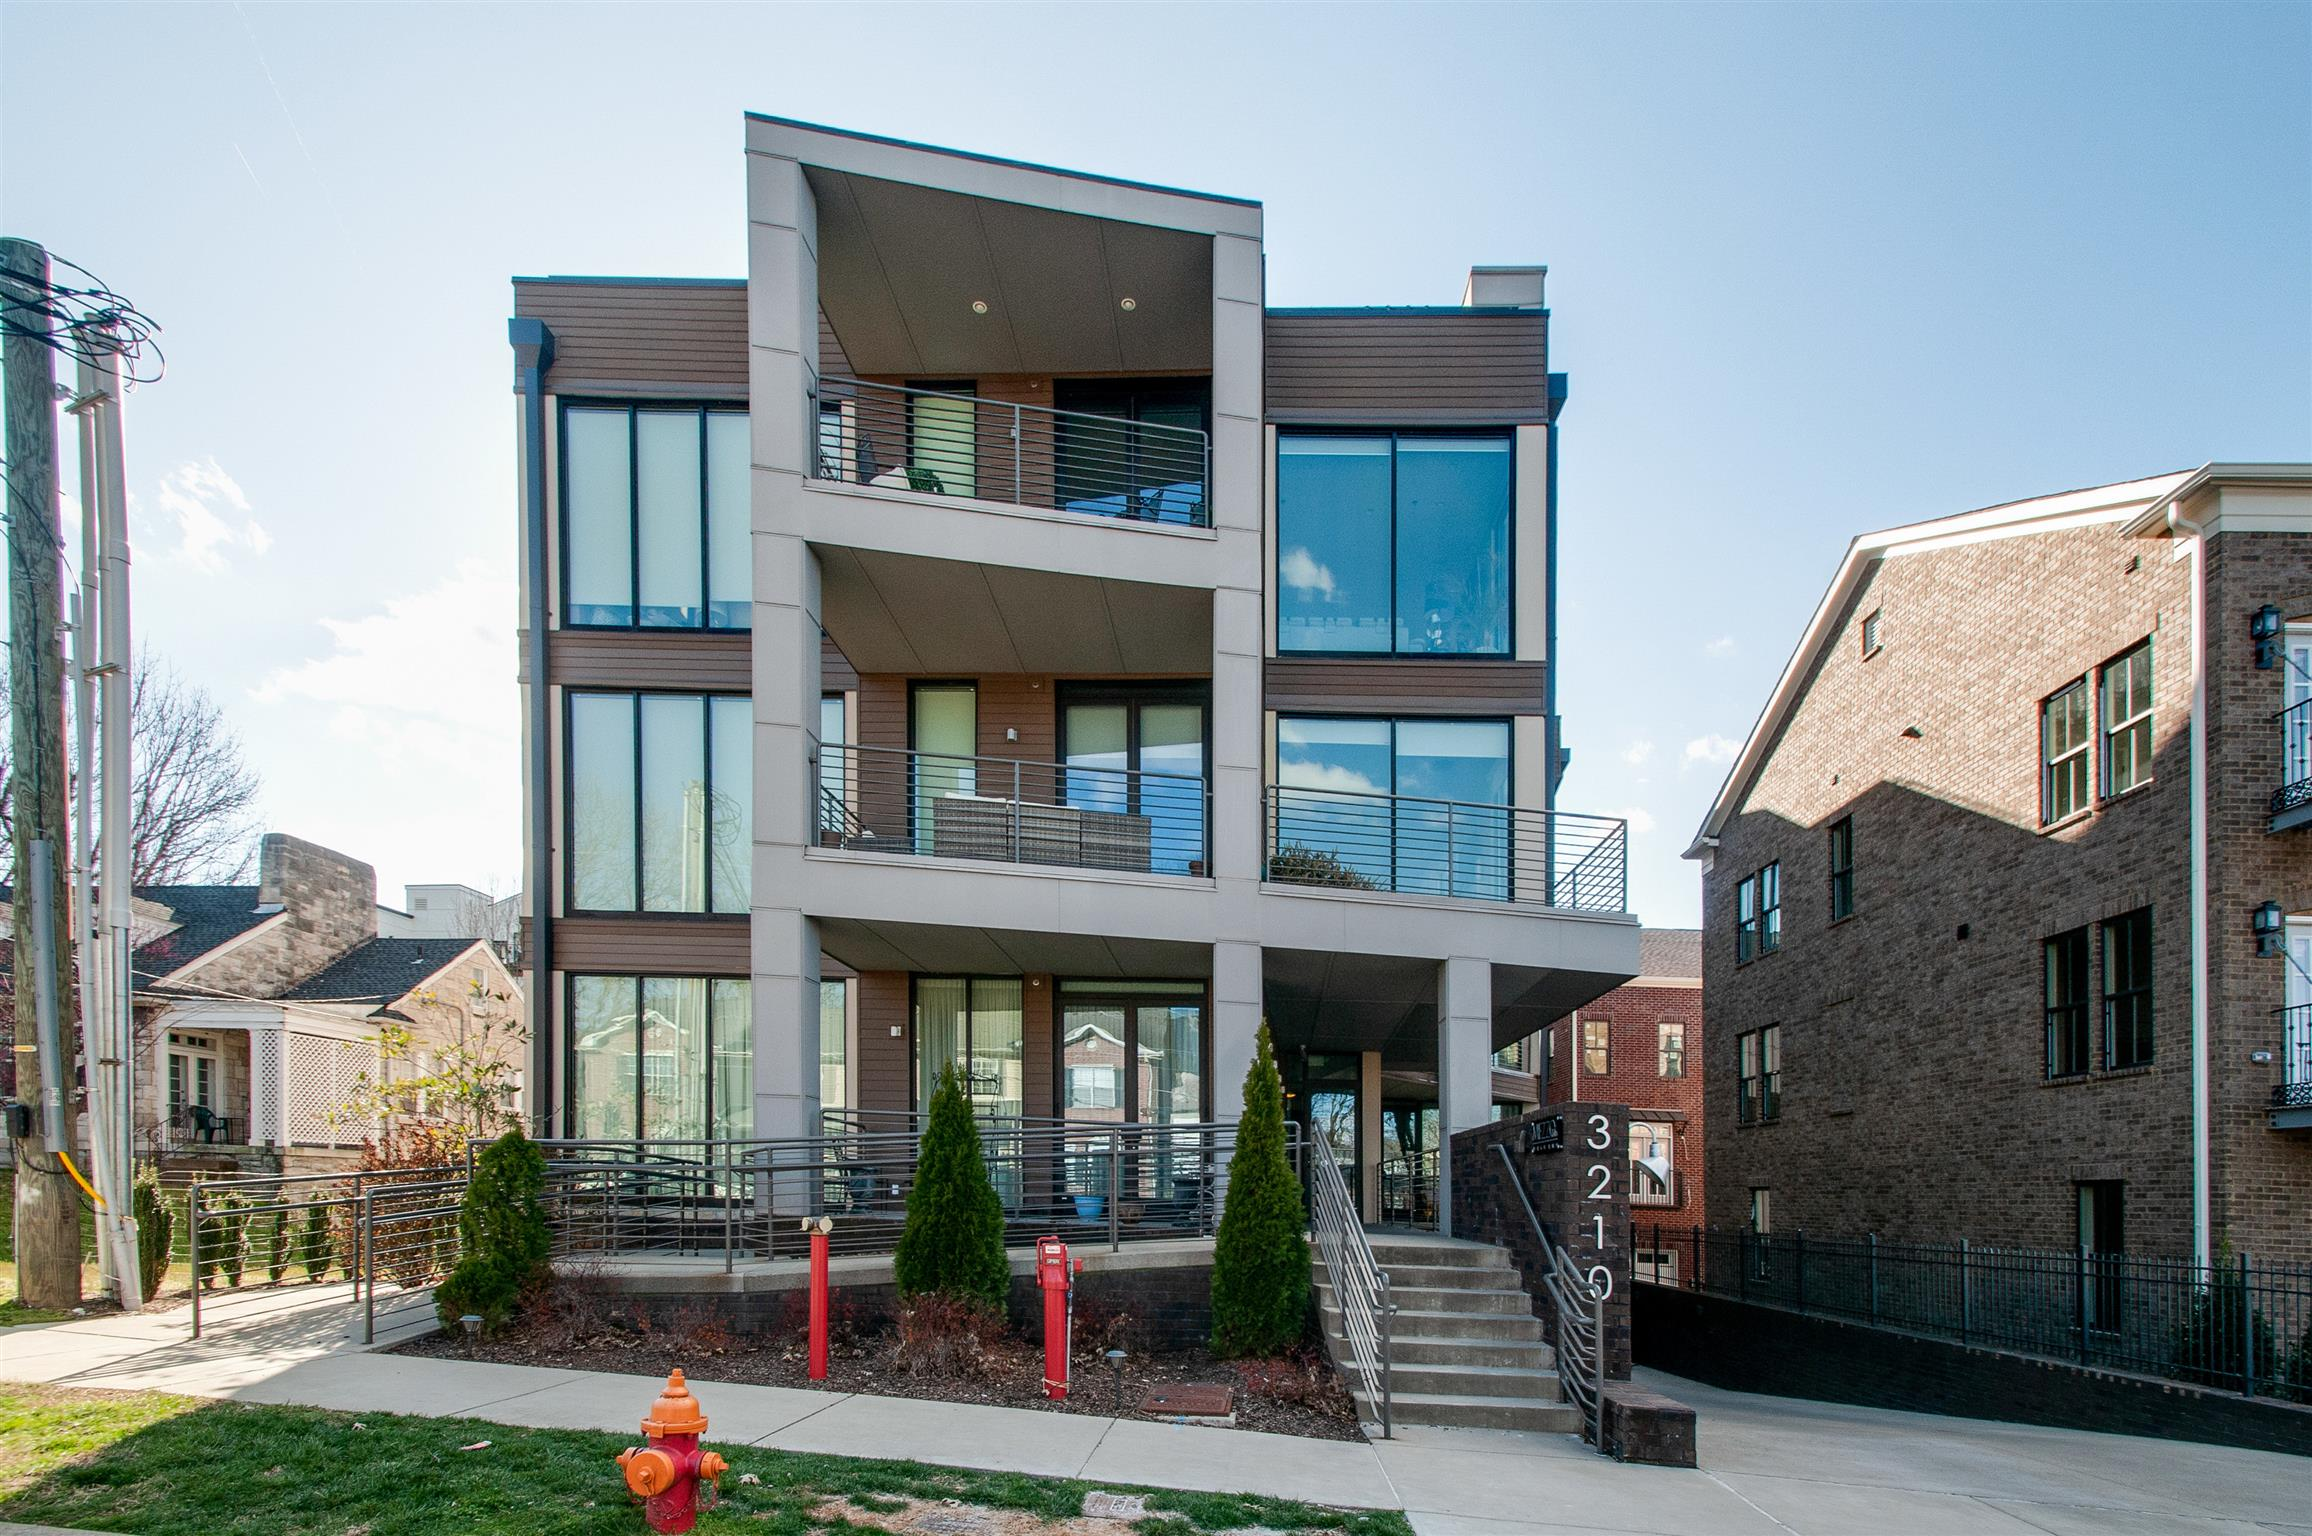 3210 Long Blvd #202, Nashville, TN 37203 - Nashville, TN real estate listing